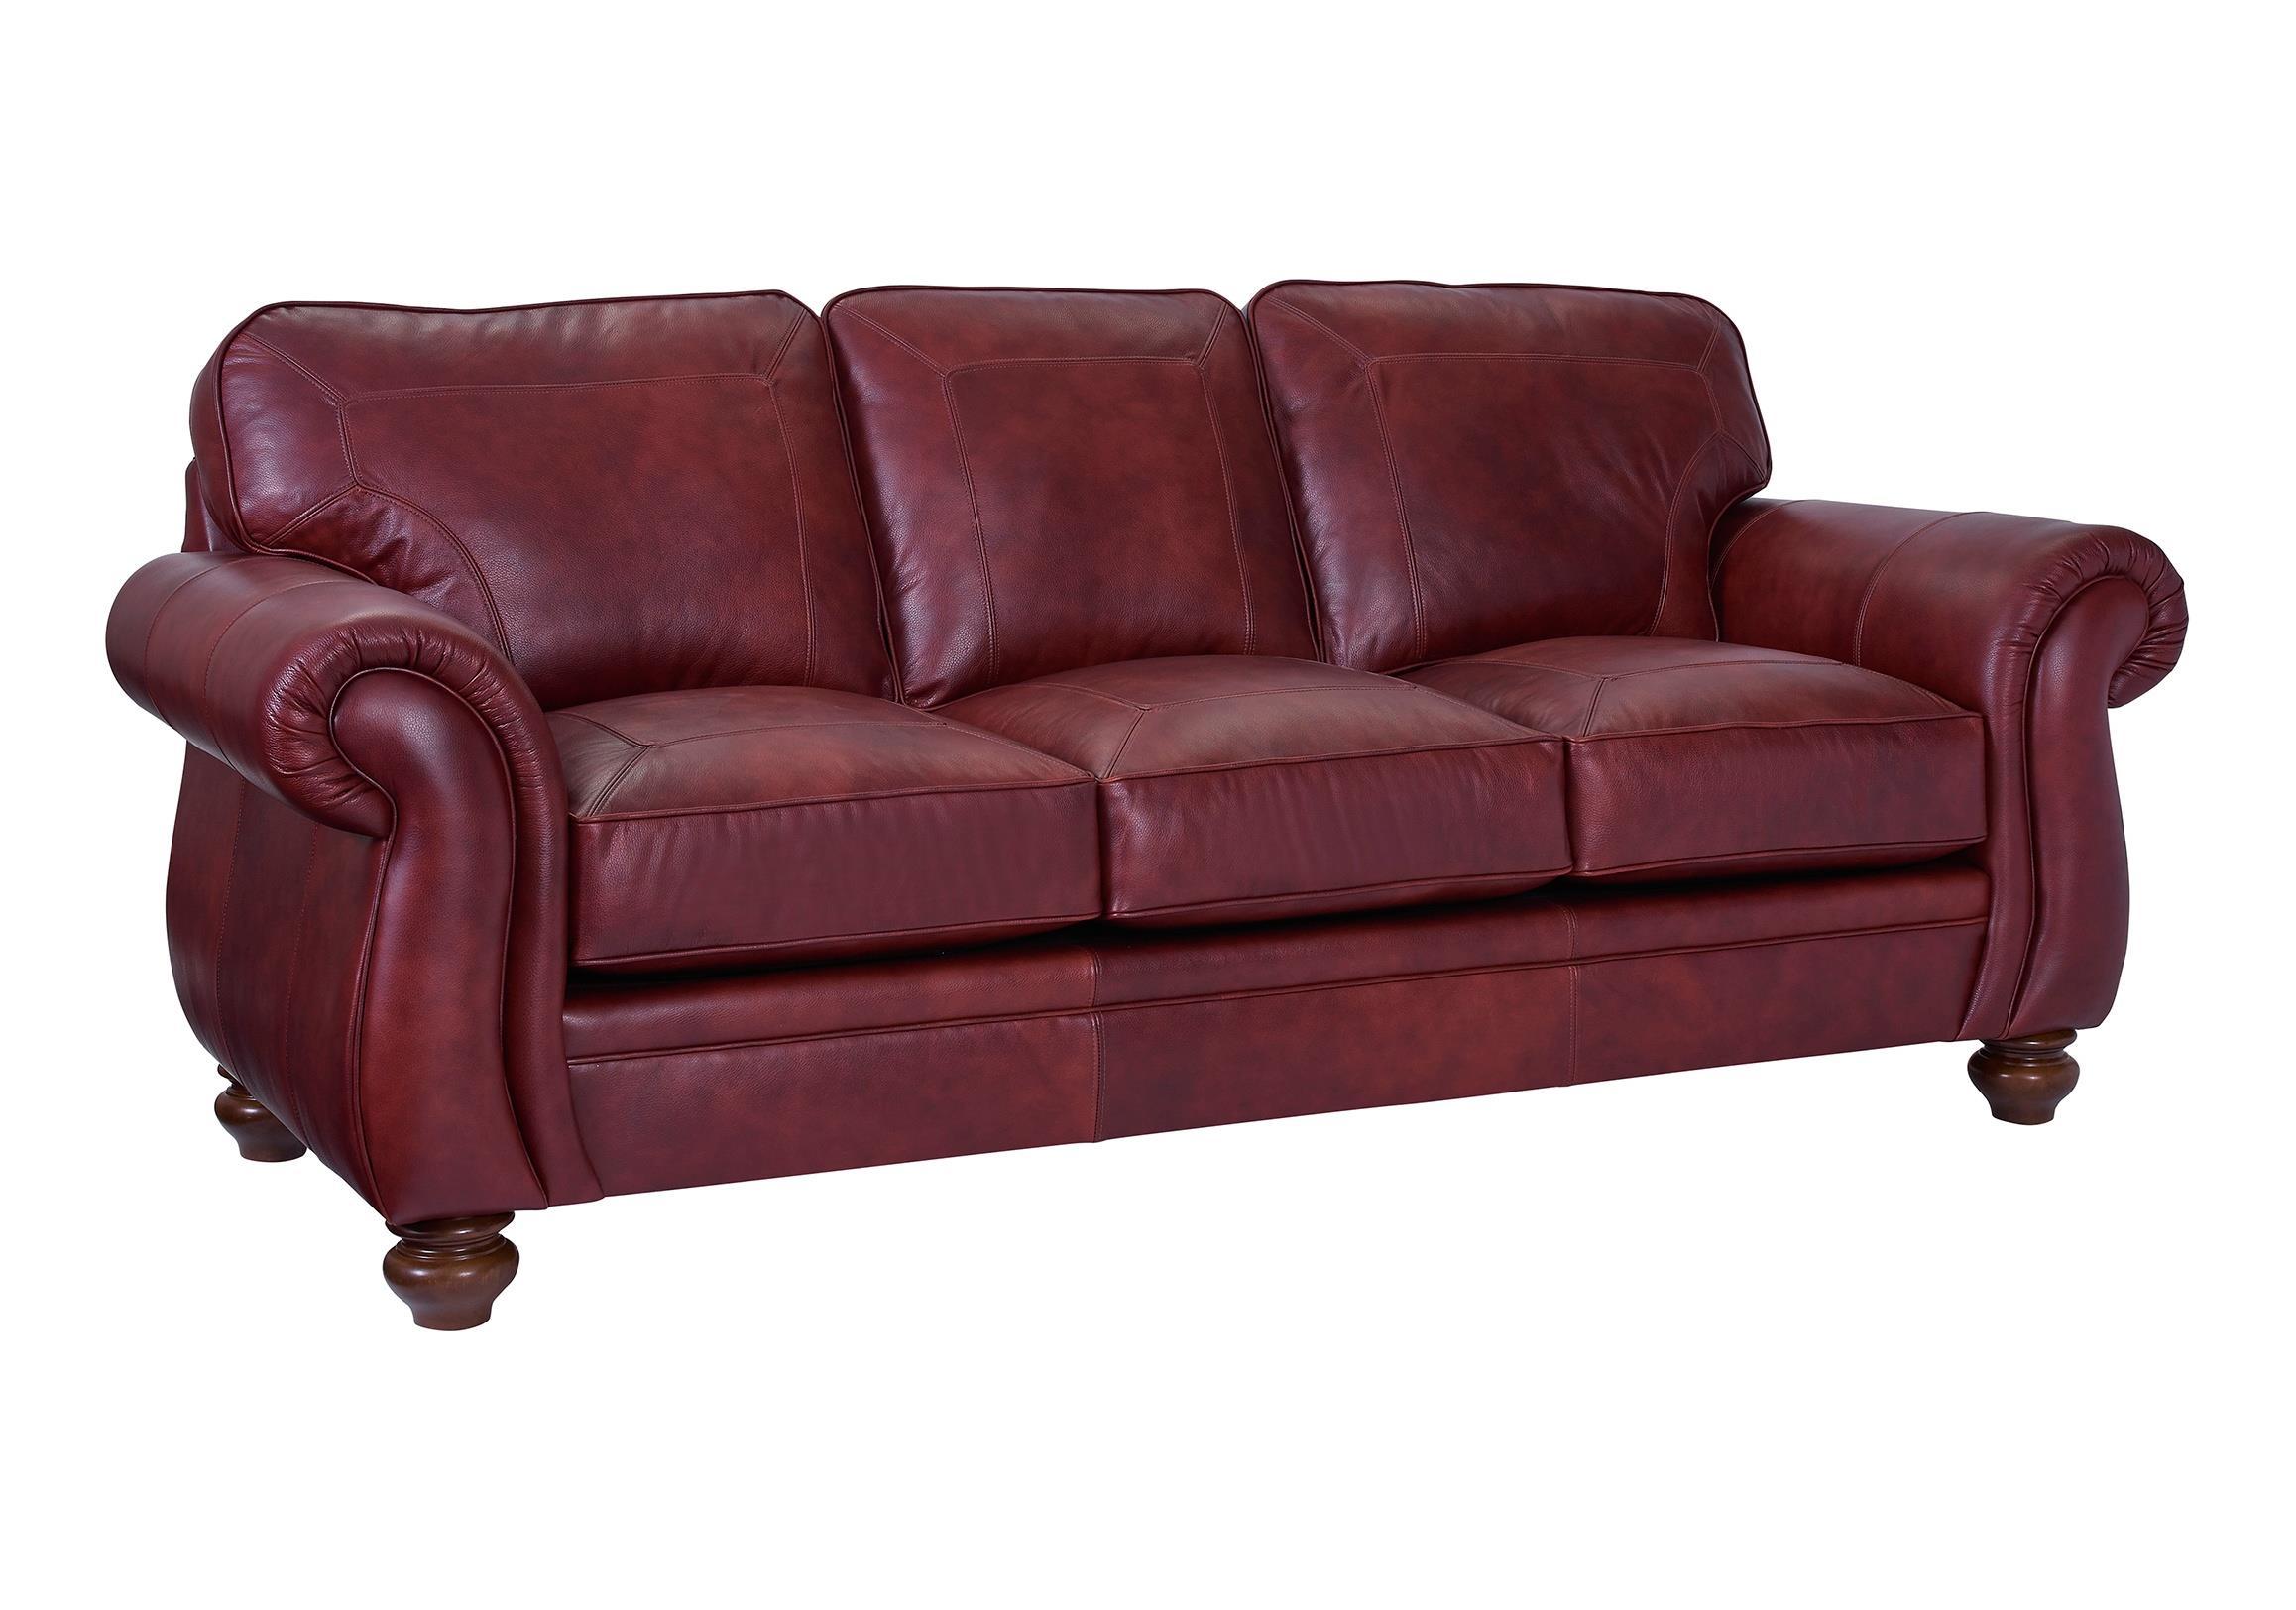 Broyhill Furniture Cassandra Traditional Stationary Sleeper Sofa - Item Number: L3688-7-0063-69